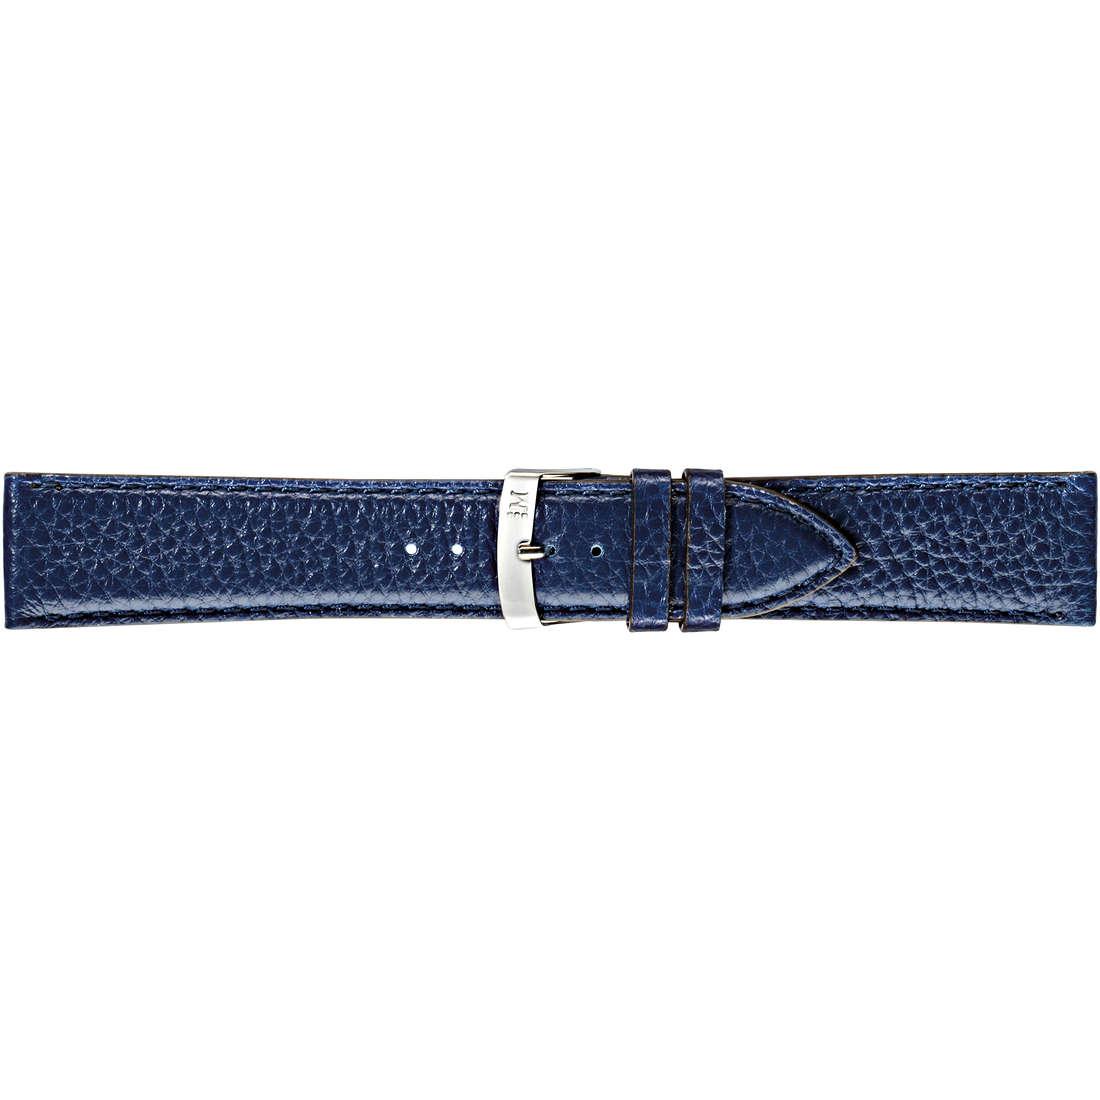 watch watch bands watch straps man Morellato Performance A01X4596B61062CR18